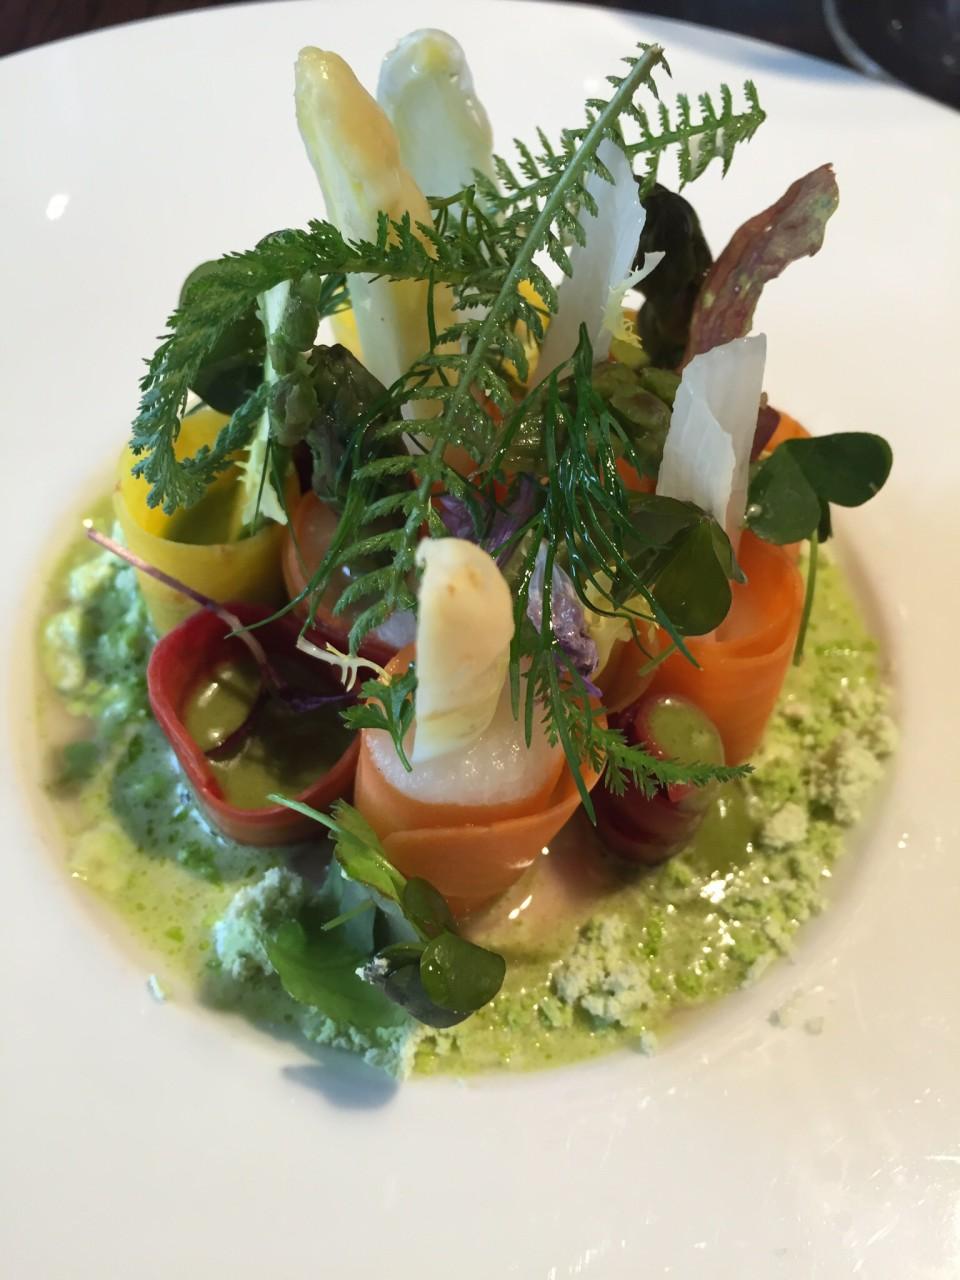 Mlynec Prague - Asparagus & Carrot Salad with Lime and Mint Dust